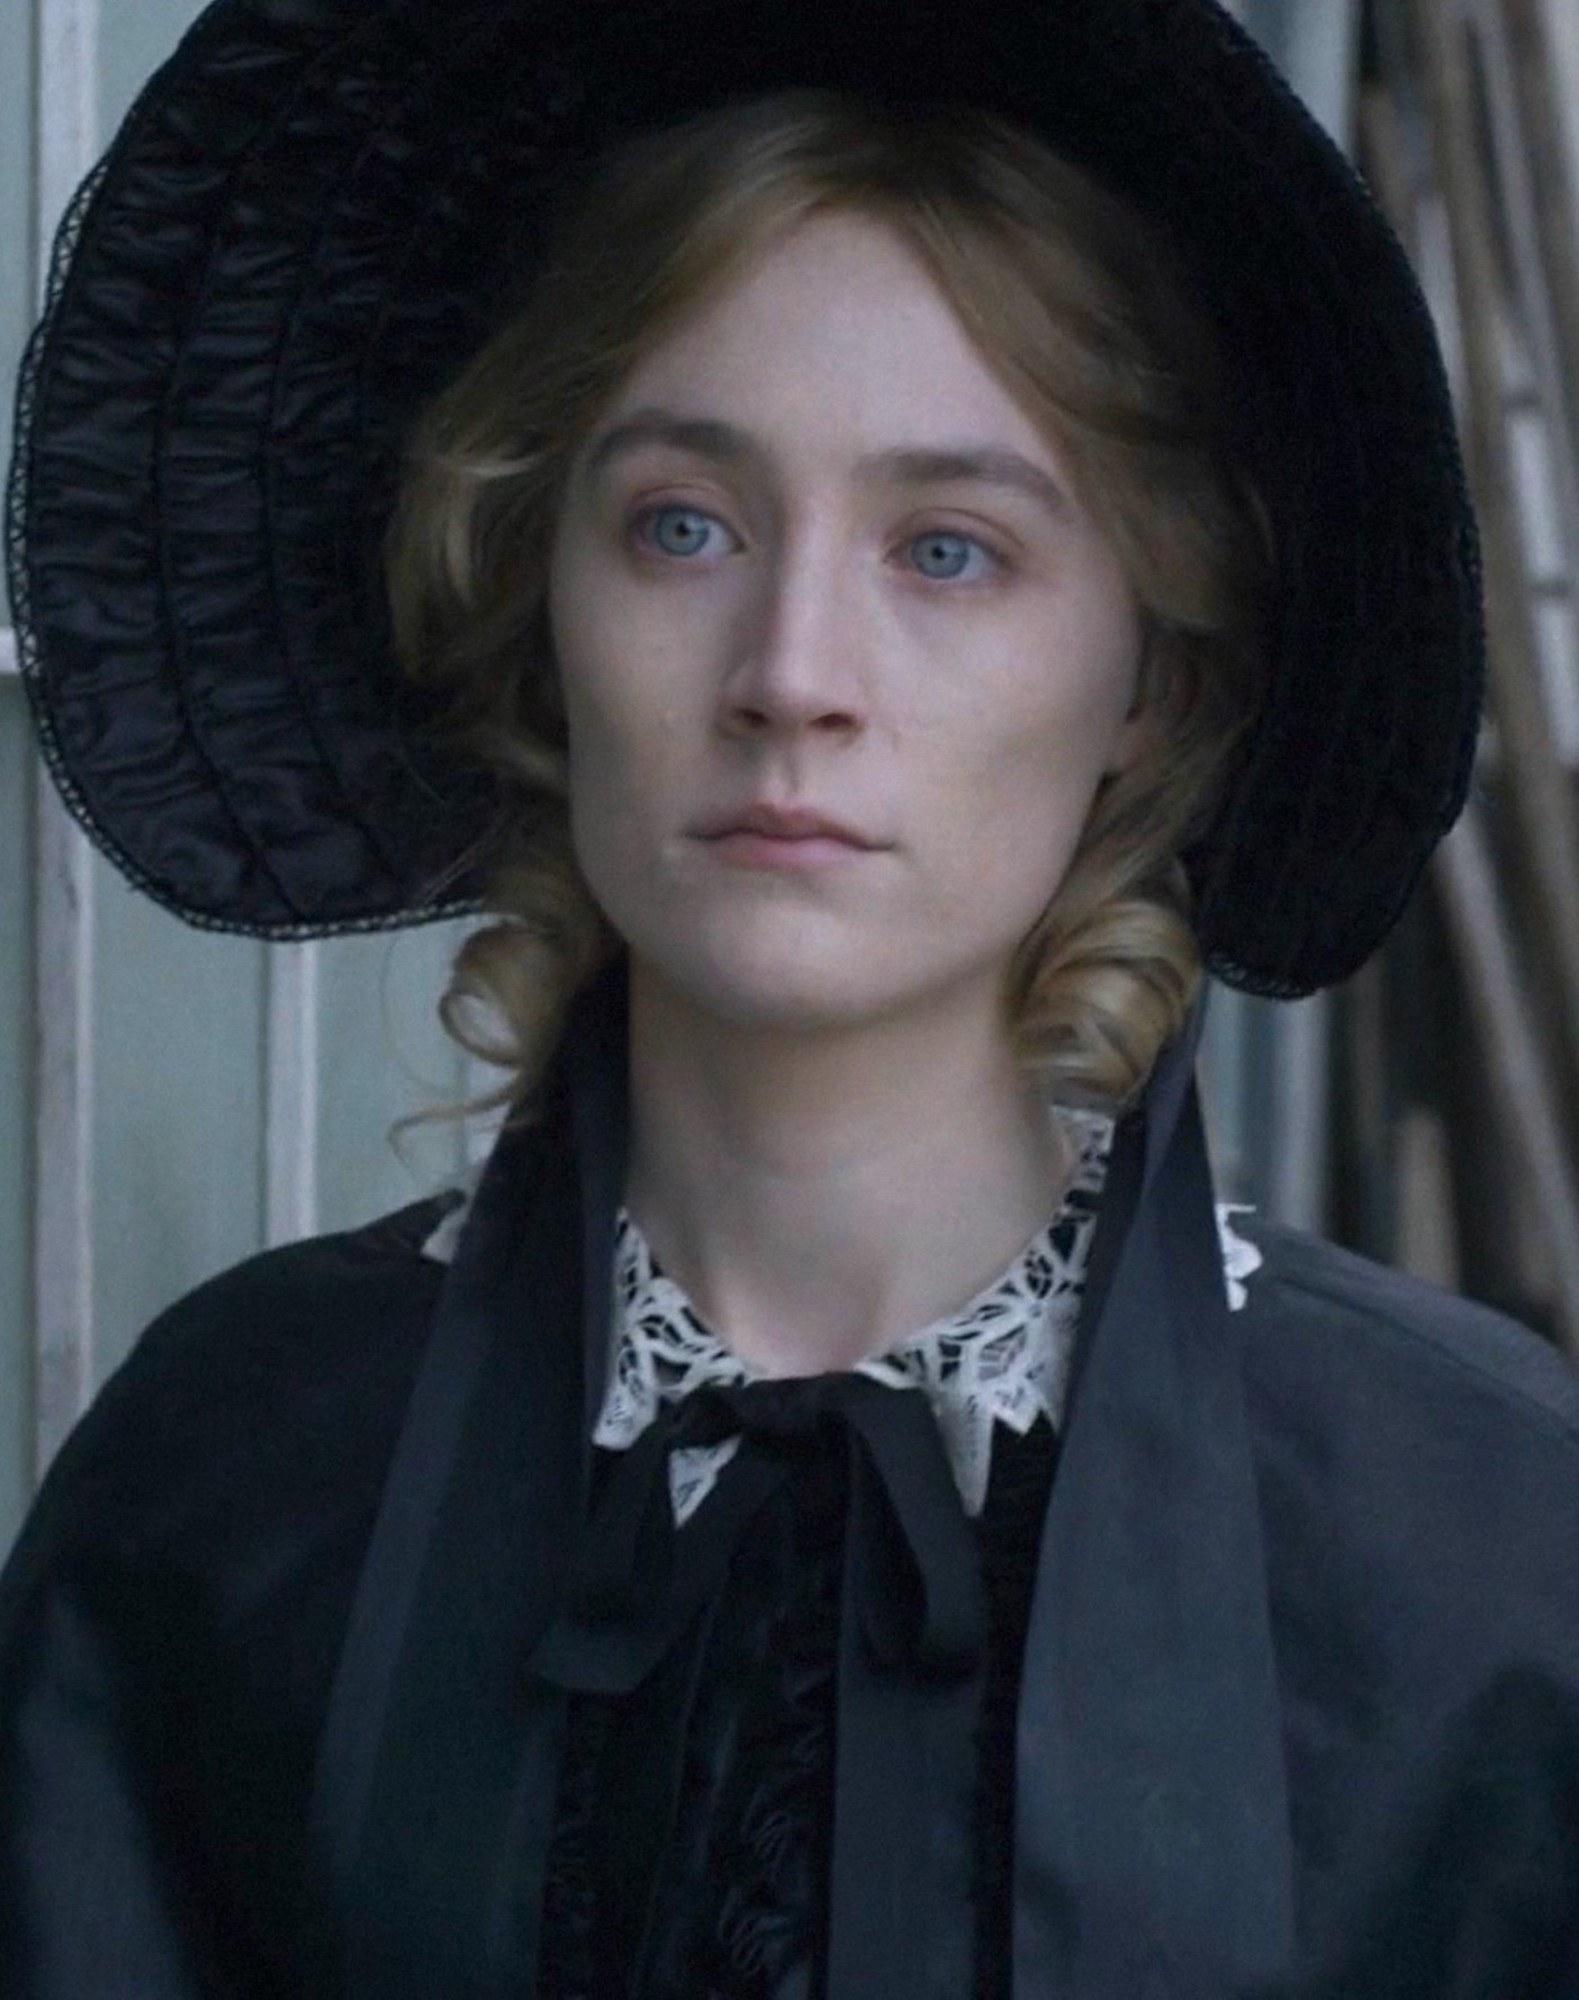 Saoirse Ronan wearing a wide brimmed hat, looking gloomy